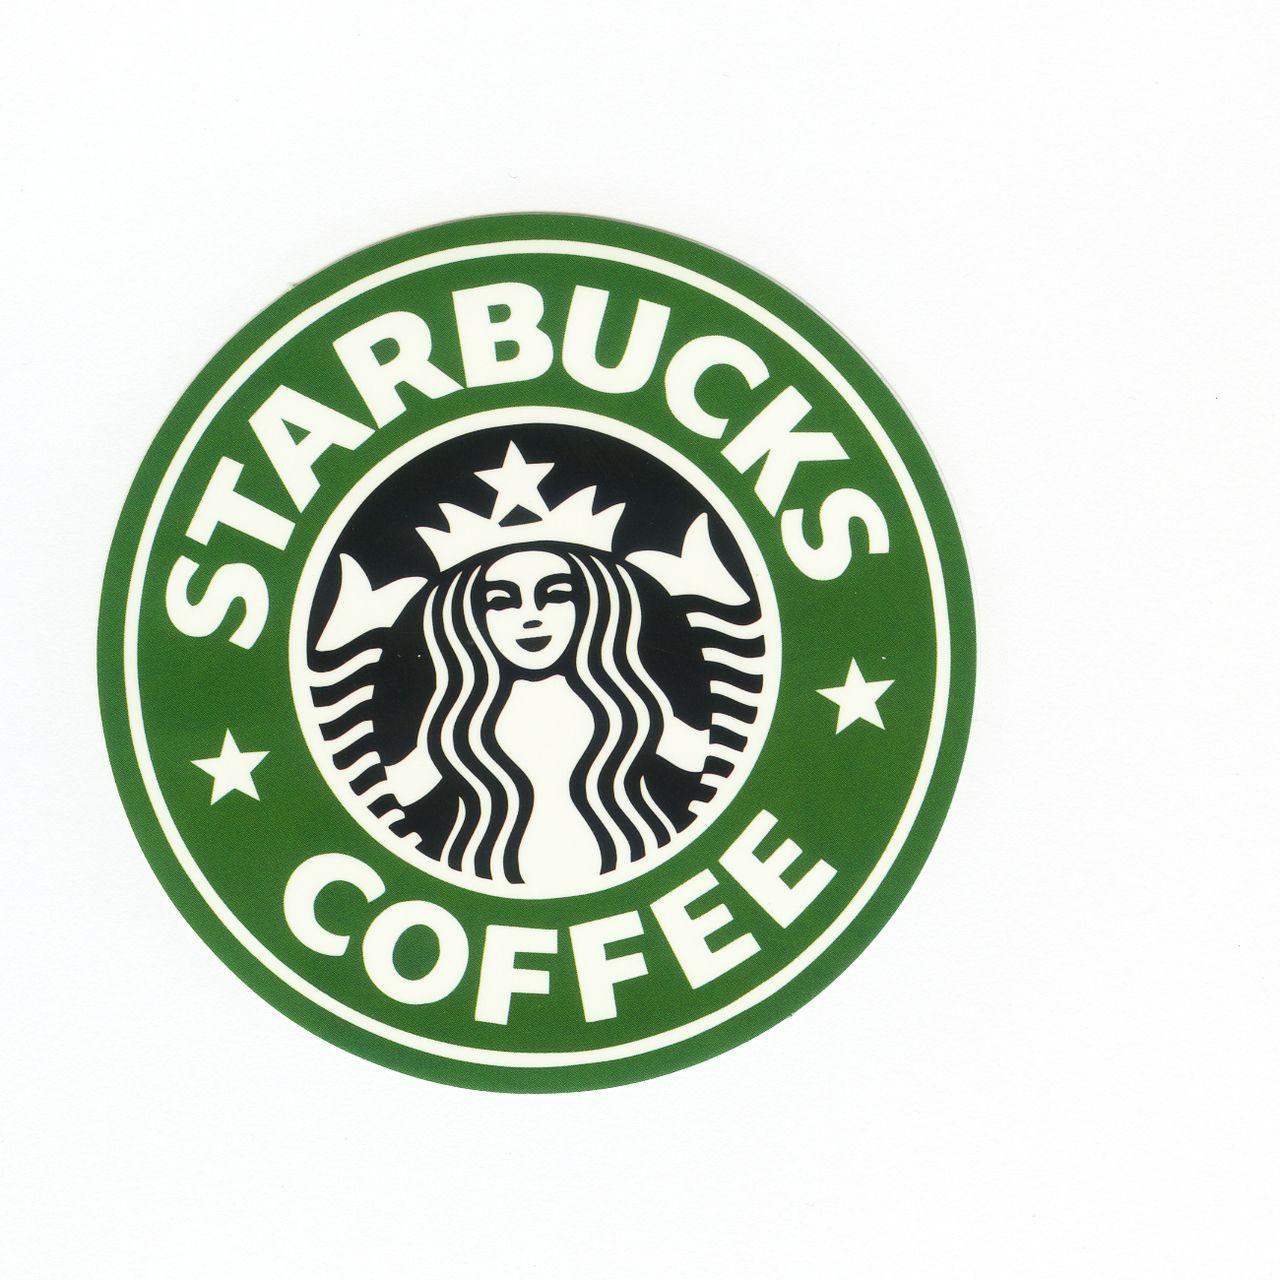 #1185 Starbucks Coffee , Width 8 cm, decal sticker - DecalStar.com